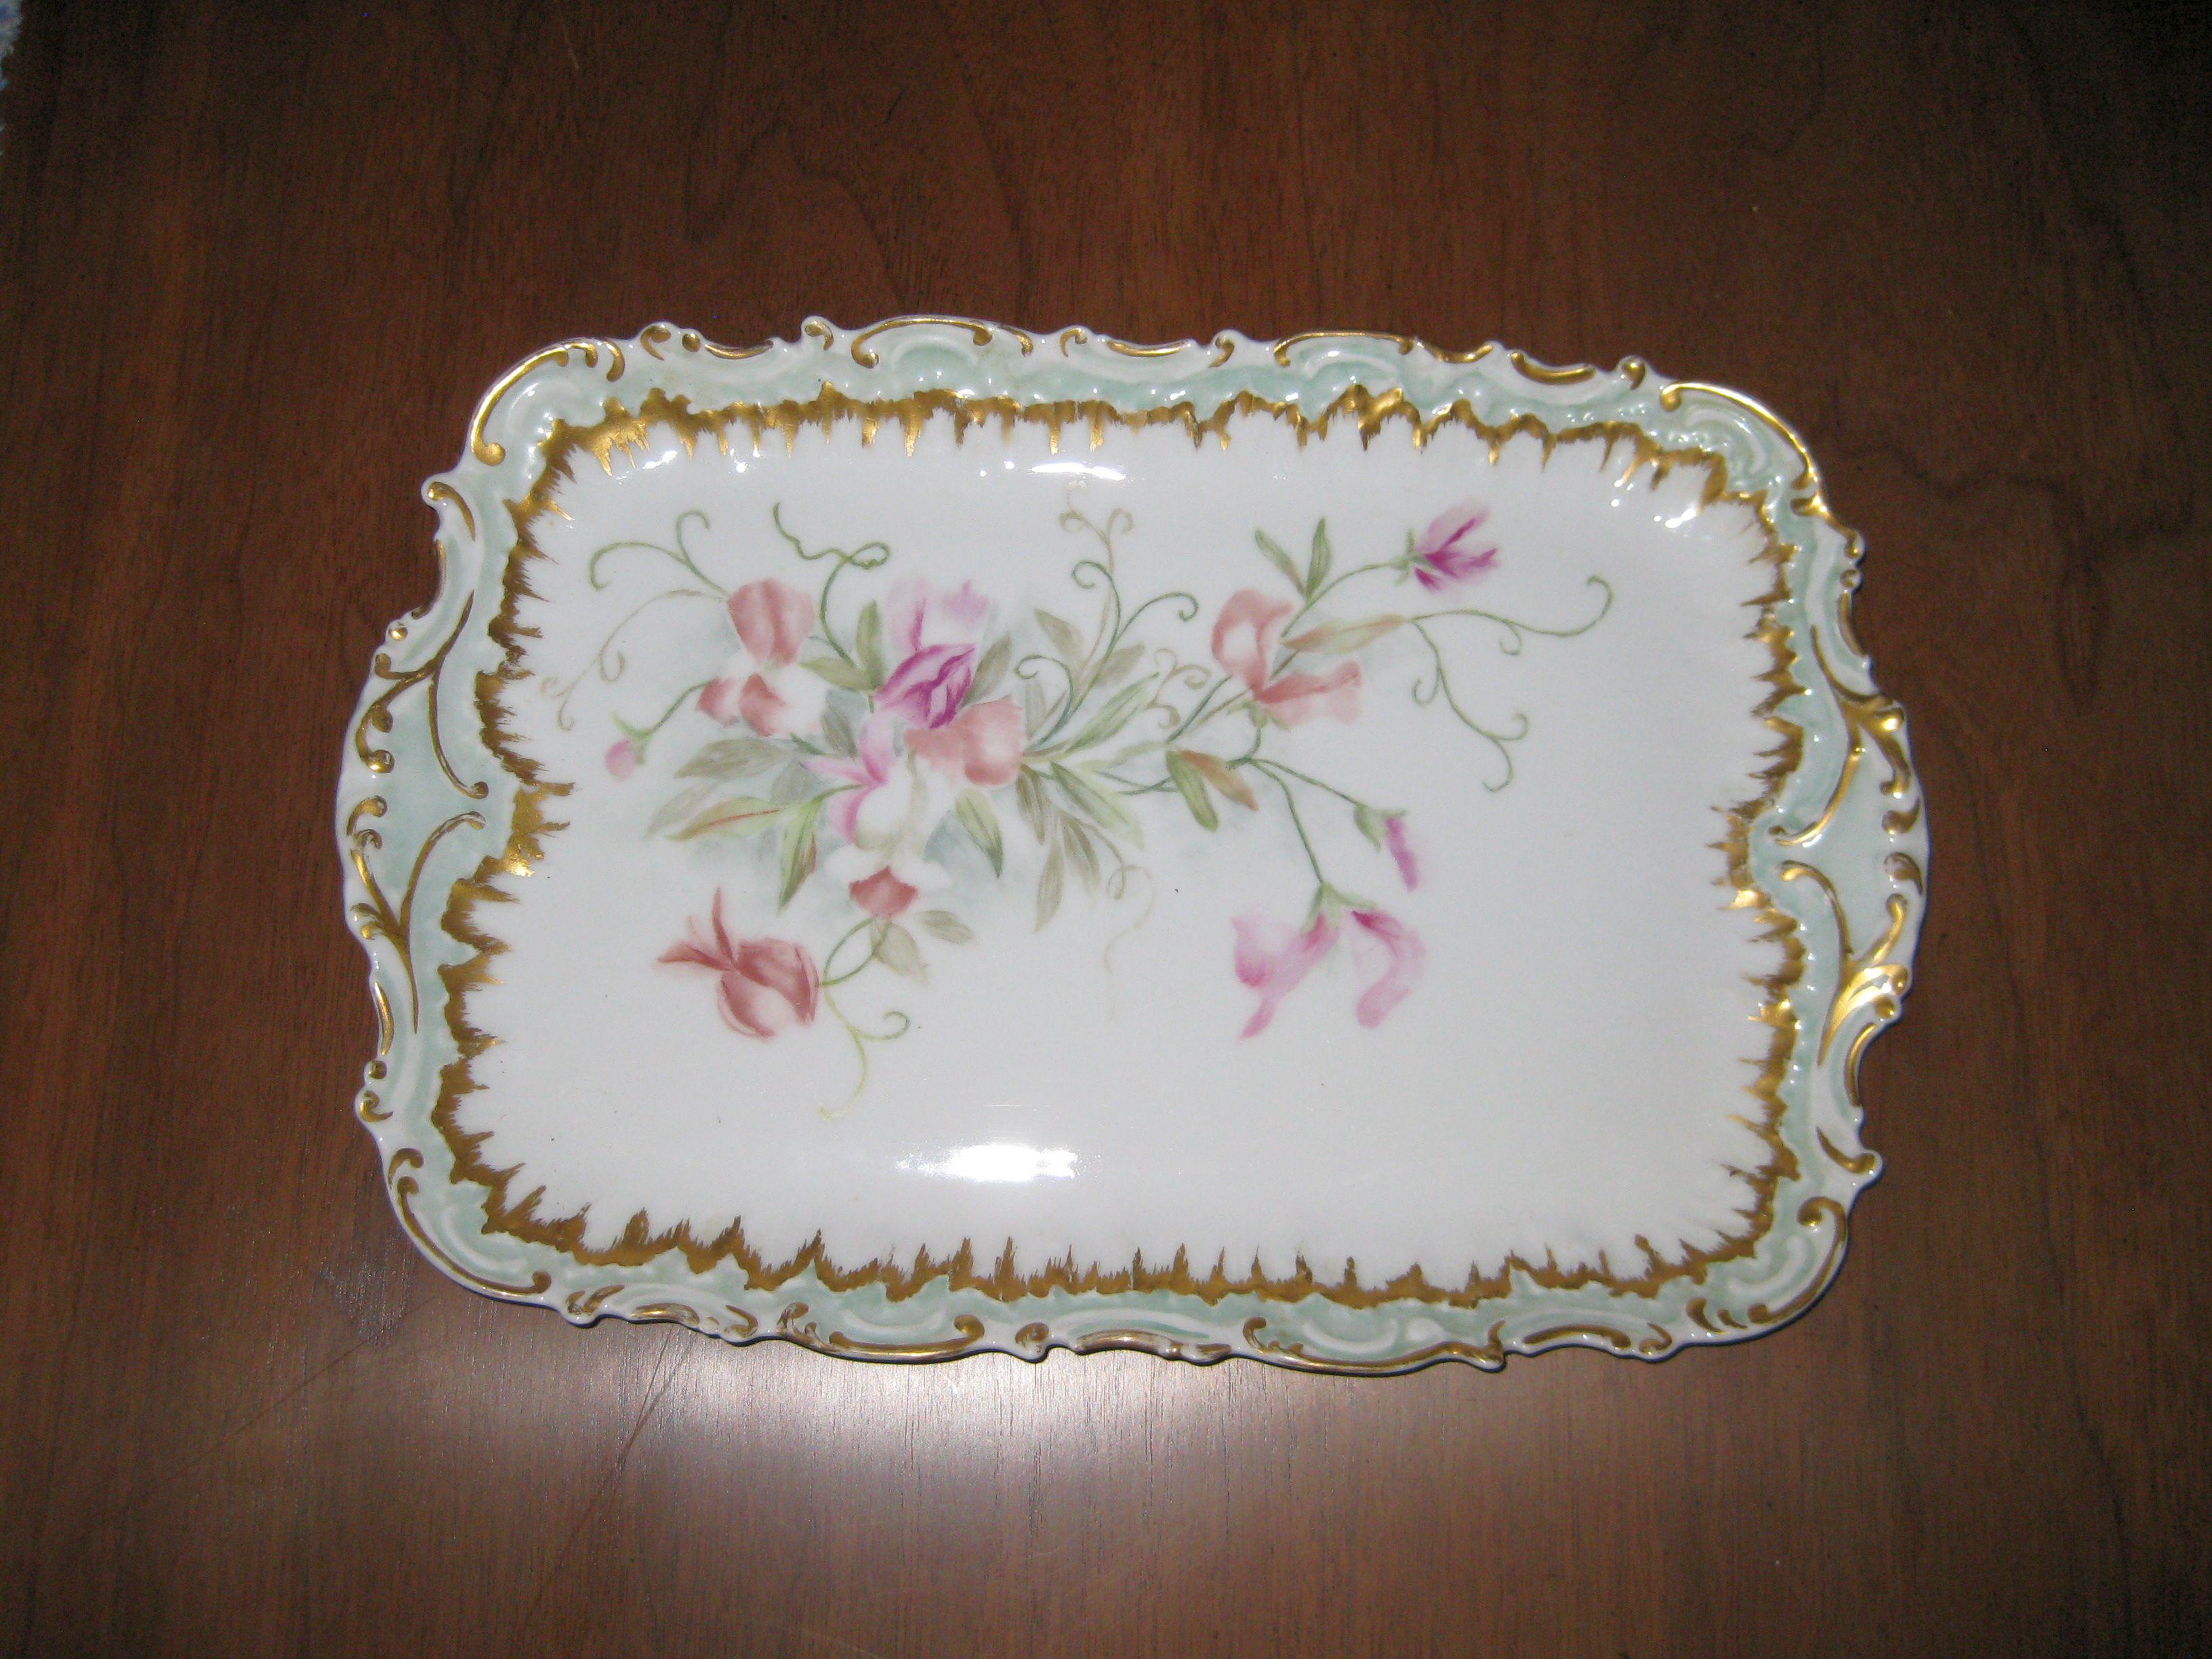 C6. Limoges Cake Plate c. 1900